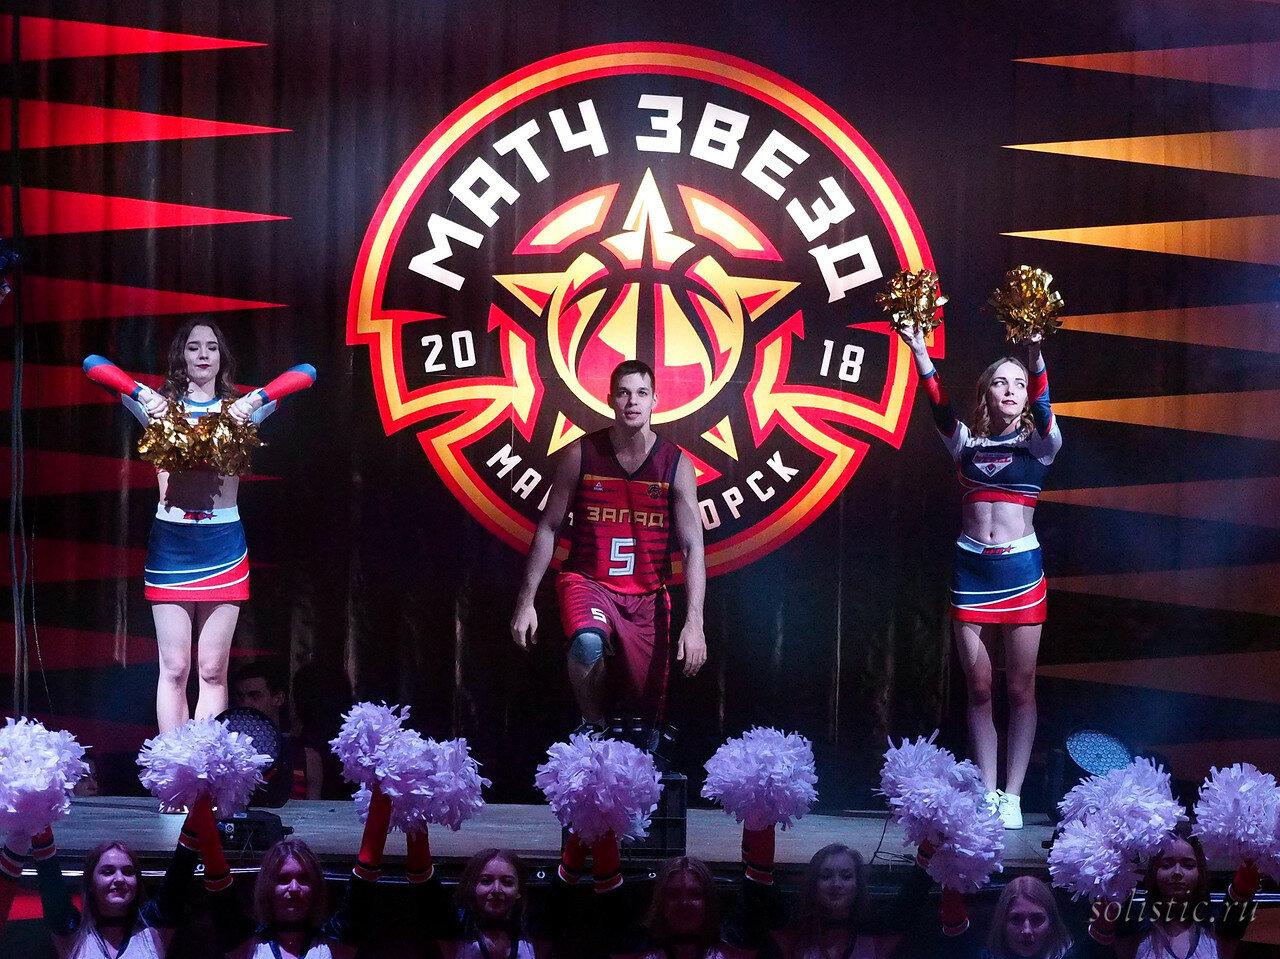 17 Матч звезд АСБ 2018 (ассоциации студенческого баскетбола)